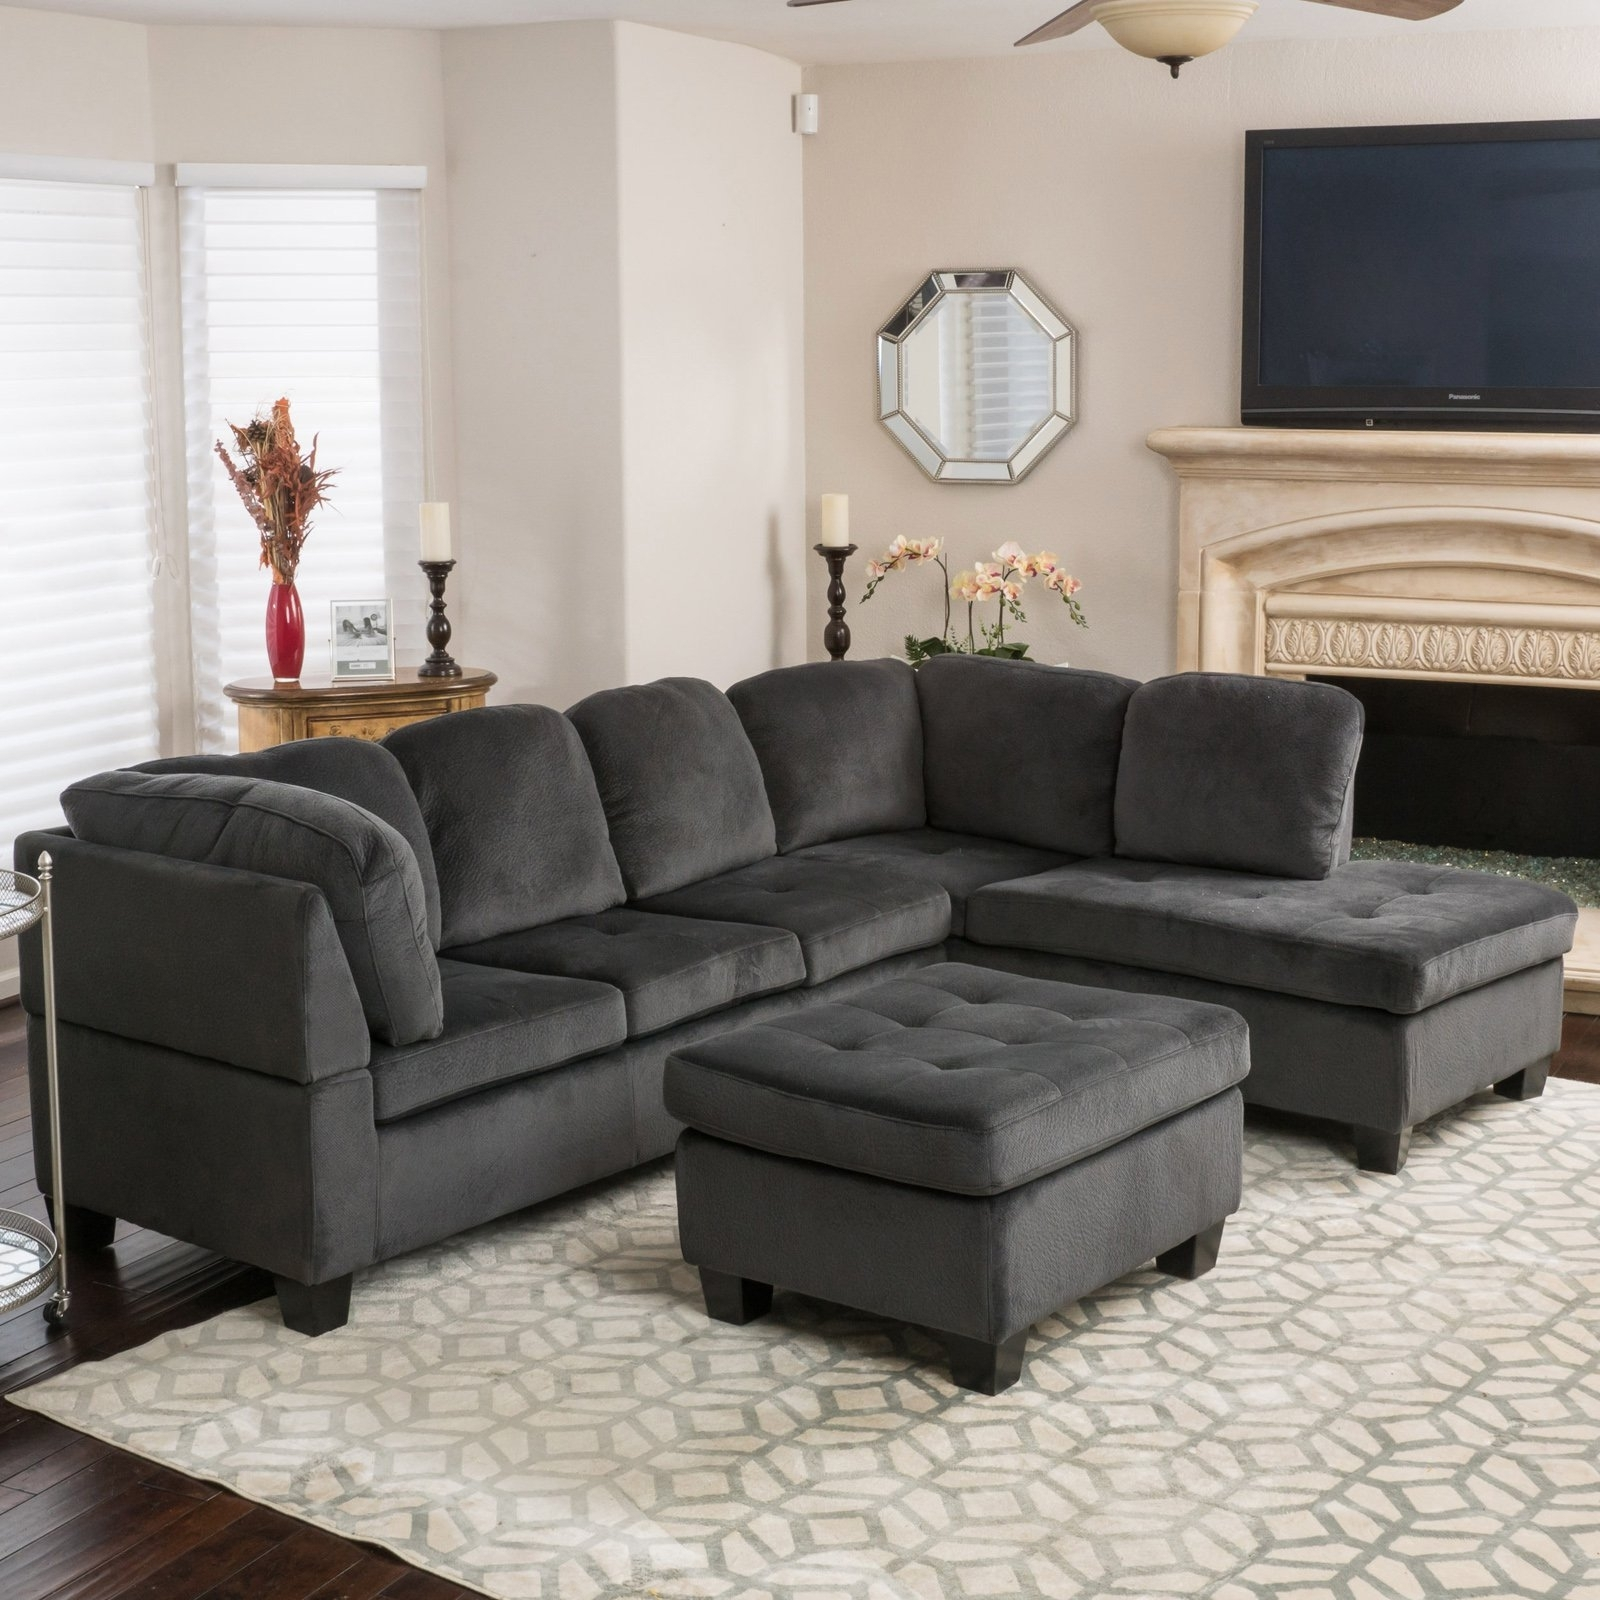 Evan 3 Piece Sectional Sofa | Hayneedle For Sierra Foam Ii 3 Piece Sectionals (Image 15 of 25)